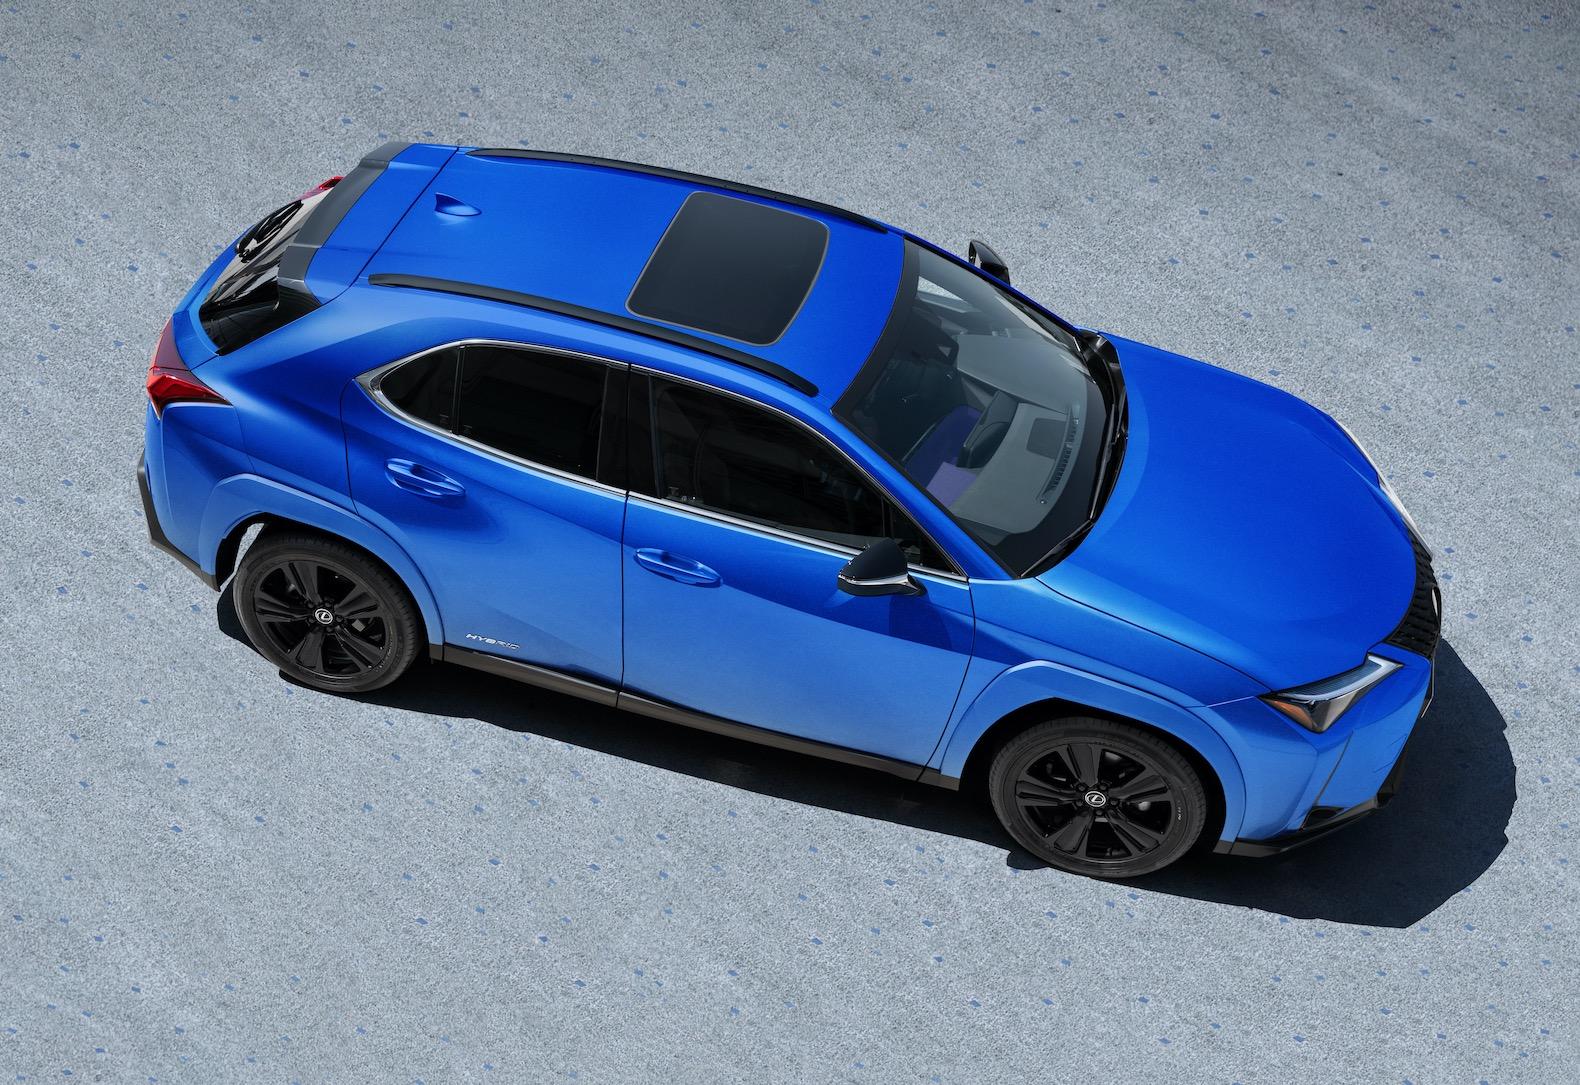 2021 Lexus UX 250h Black Line Special Edition looks ...